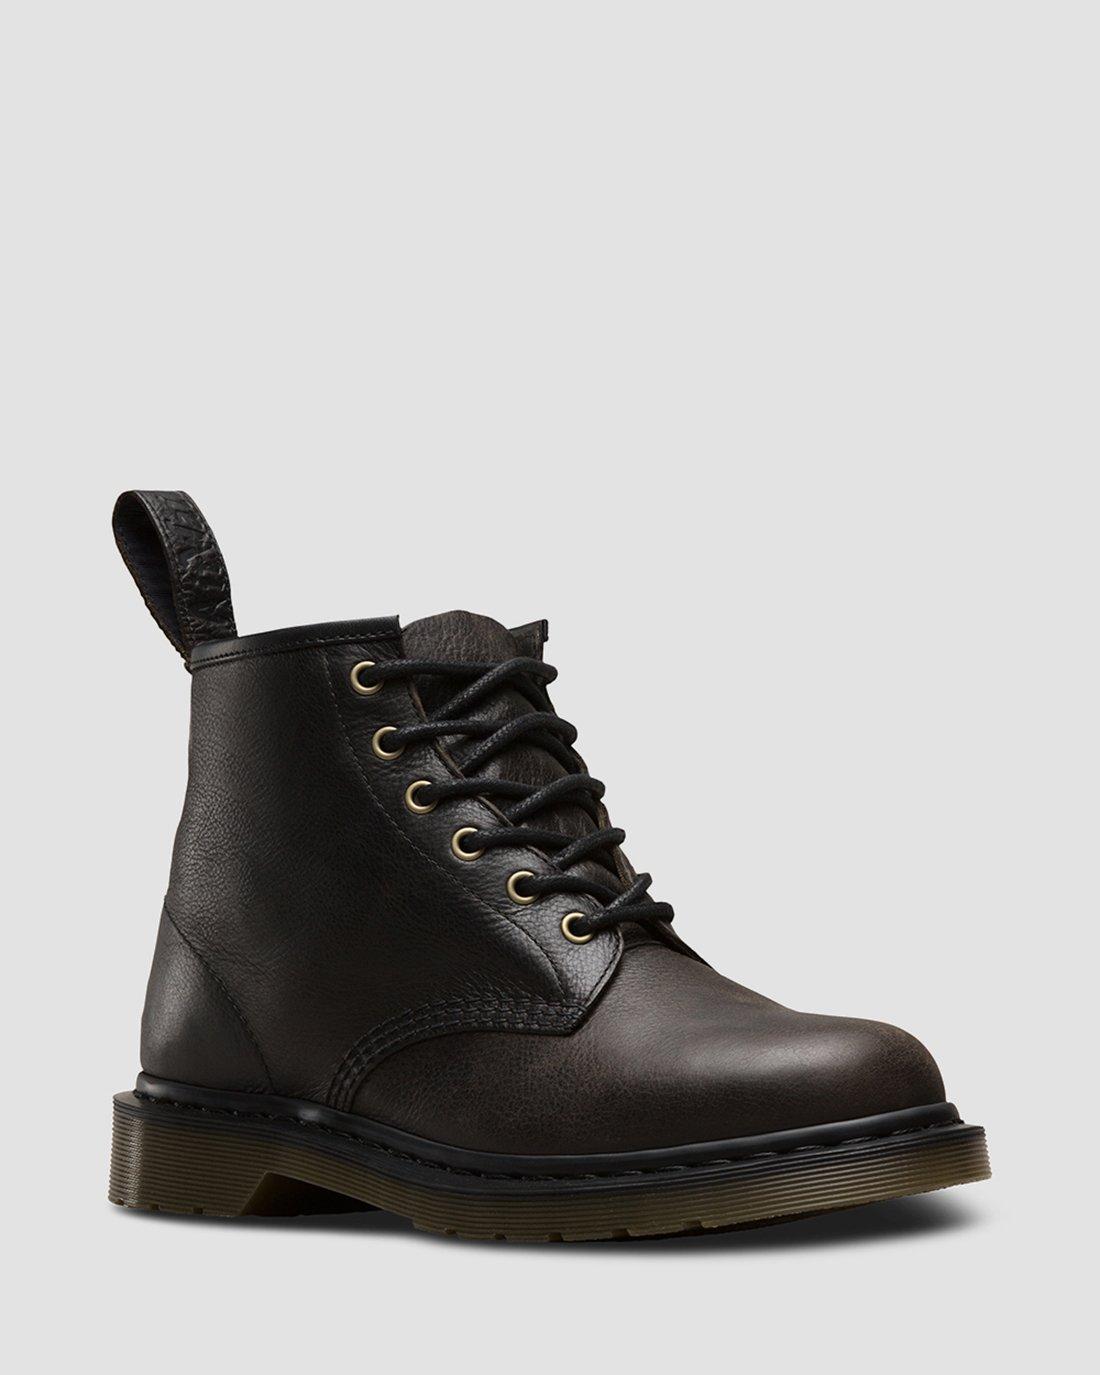 6 Six SHOE SHINE SPONGE for POLISHING Mens or ladys Shoes